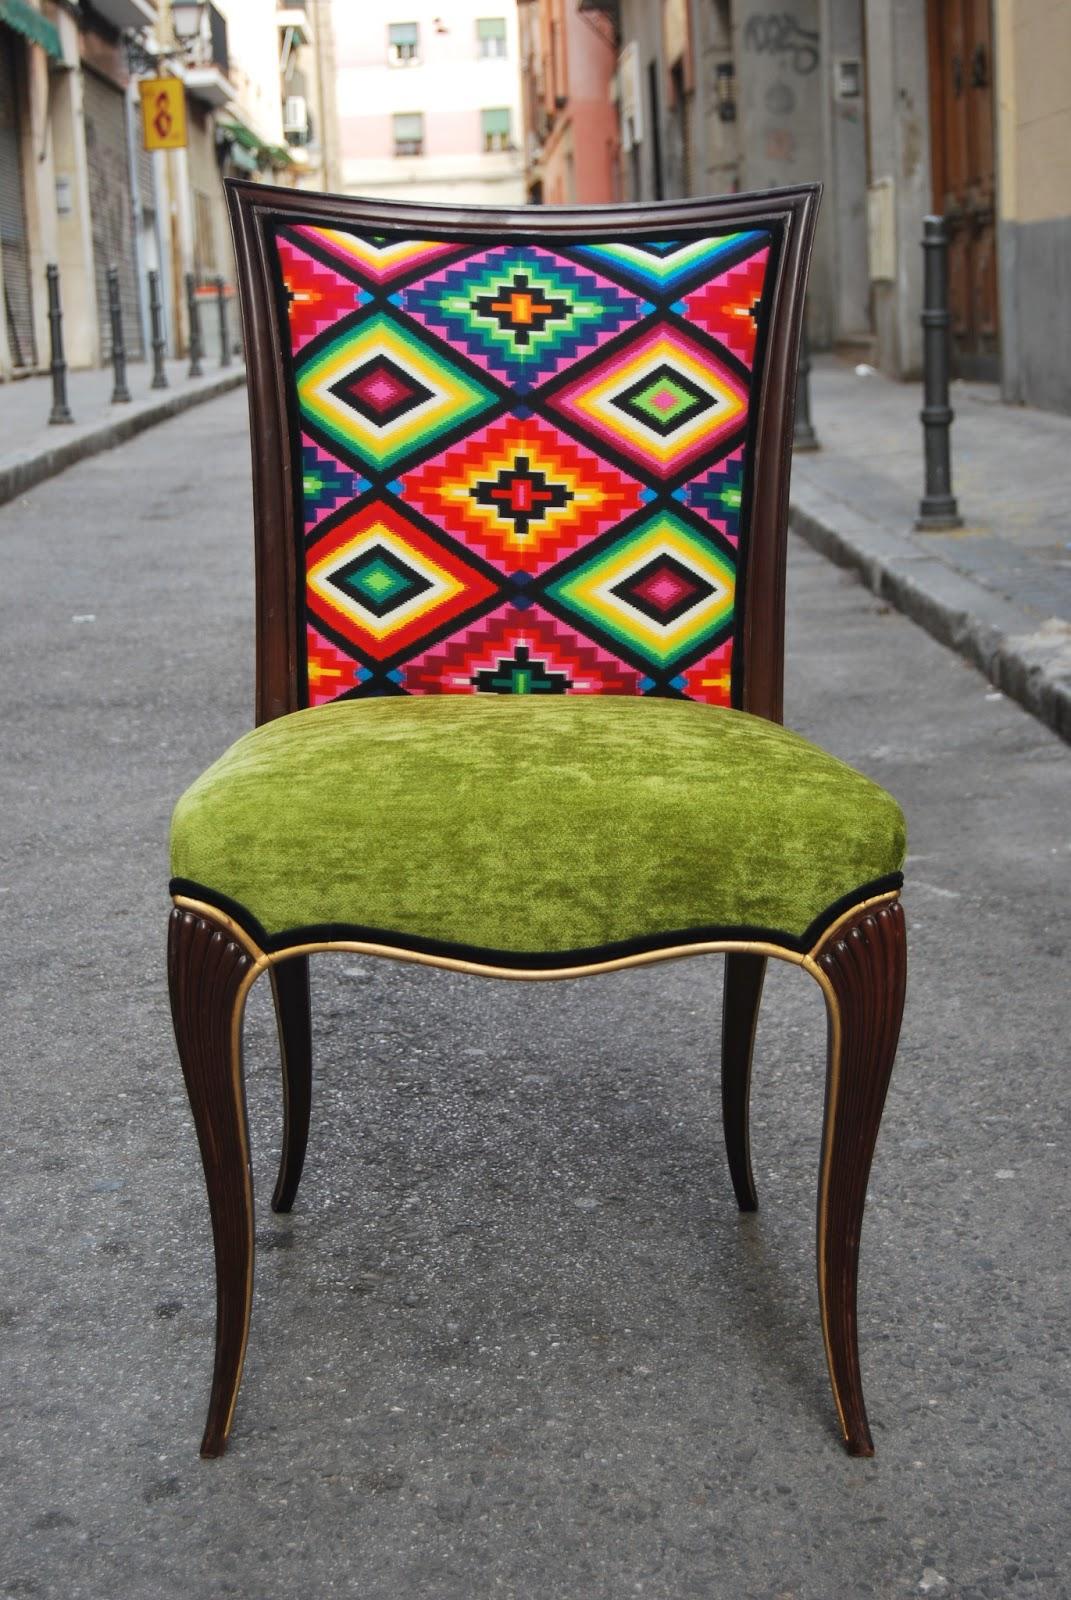 La tapicera sillas tapizadas con tela de motivos mejicanos for Modelos de sillas tapizadas modernas